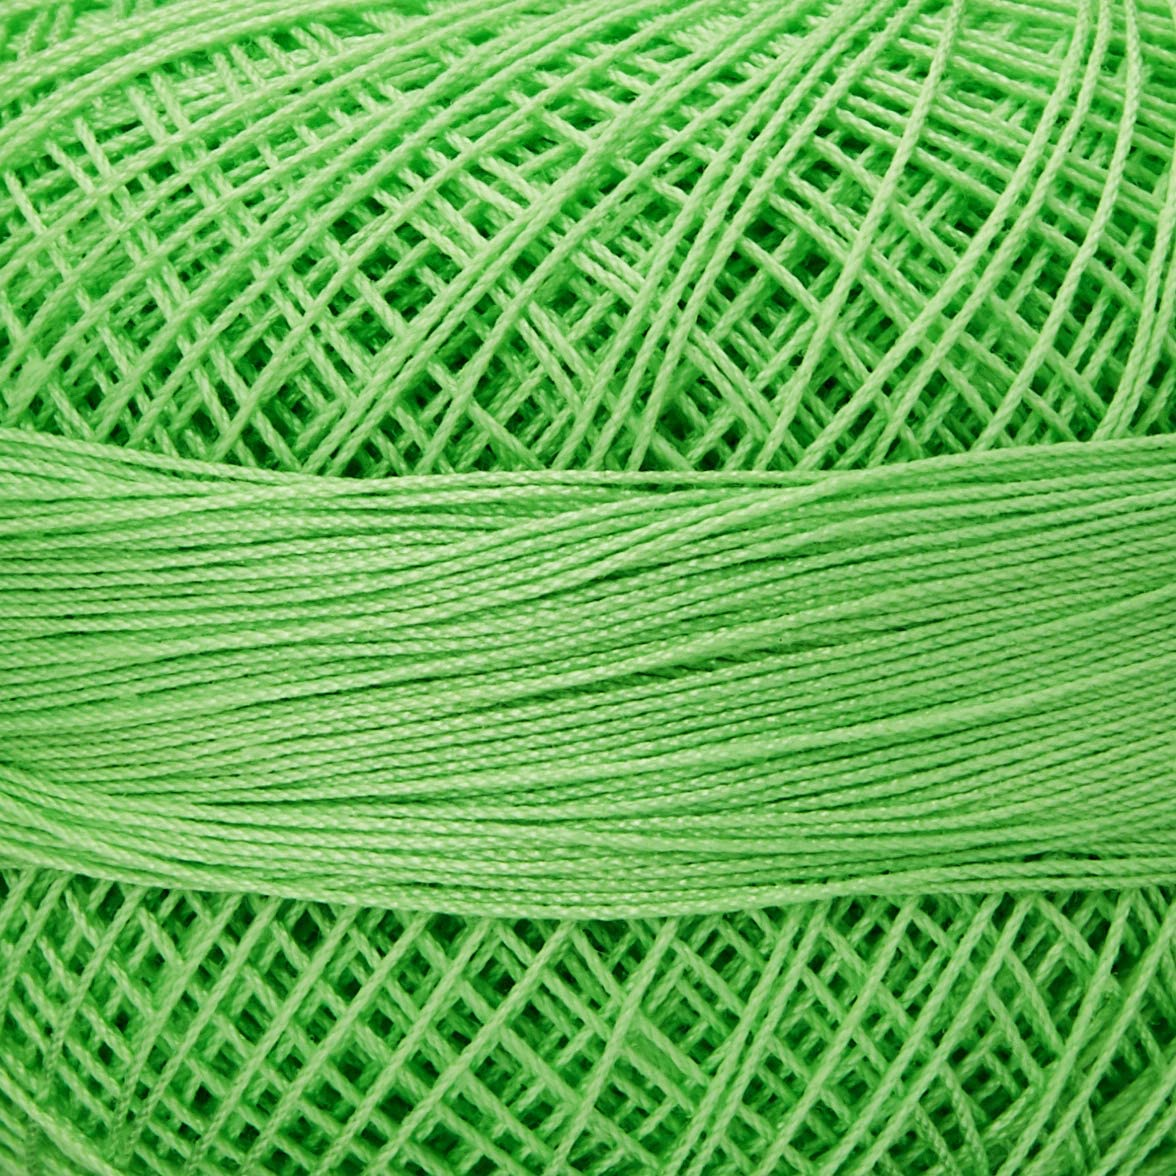 Lizbeth Size 80 HH80 Lizbeth Cotton Thread 184 yds 10 Grams Christmas Delight